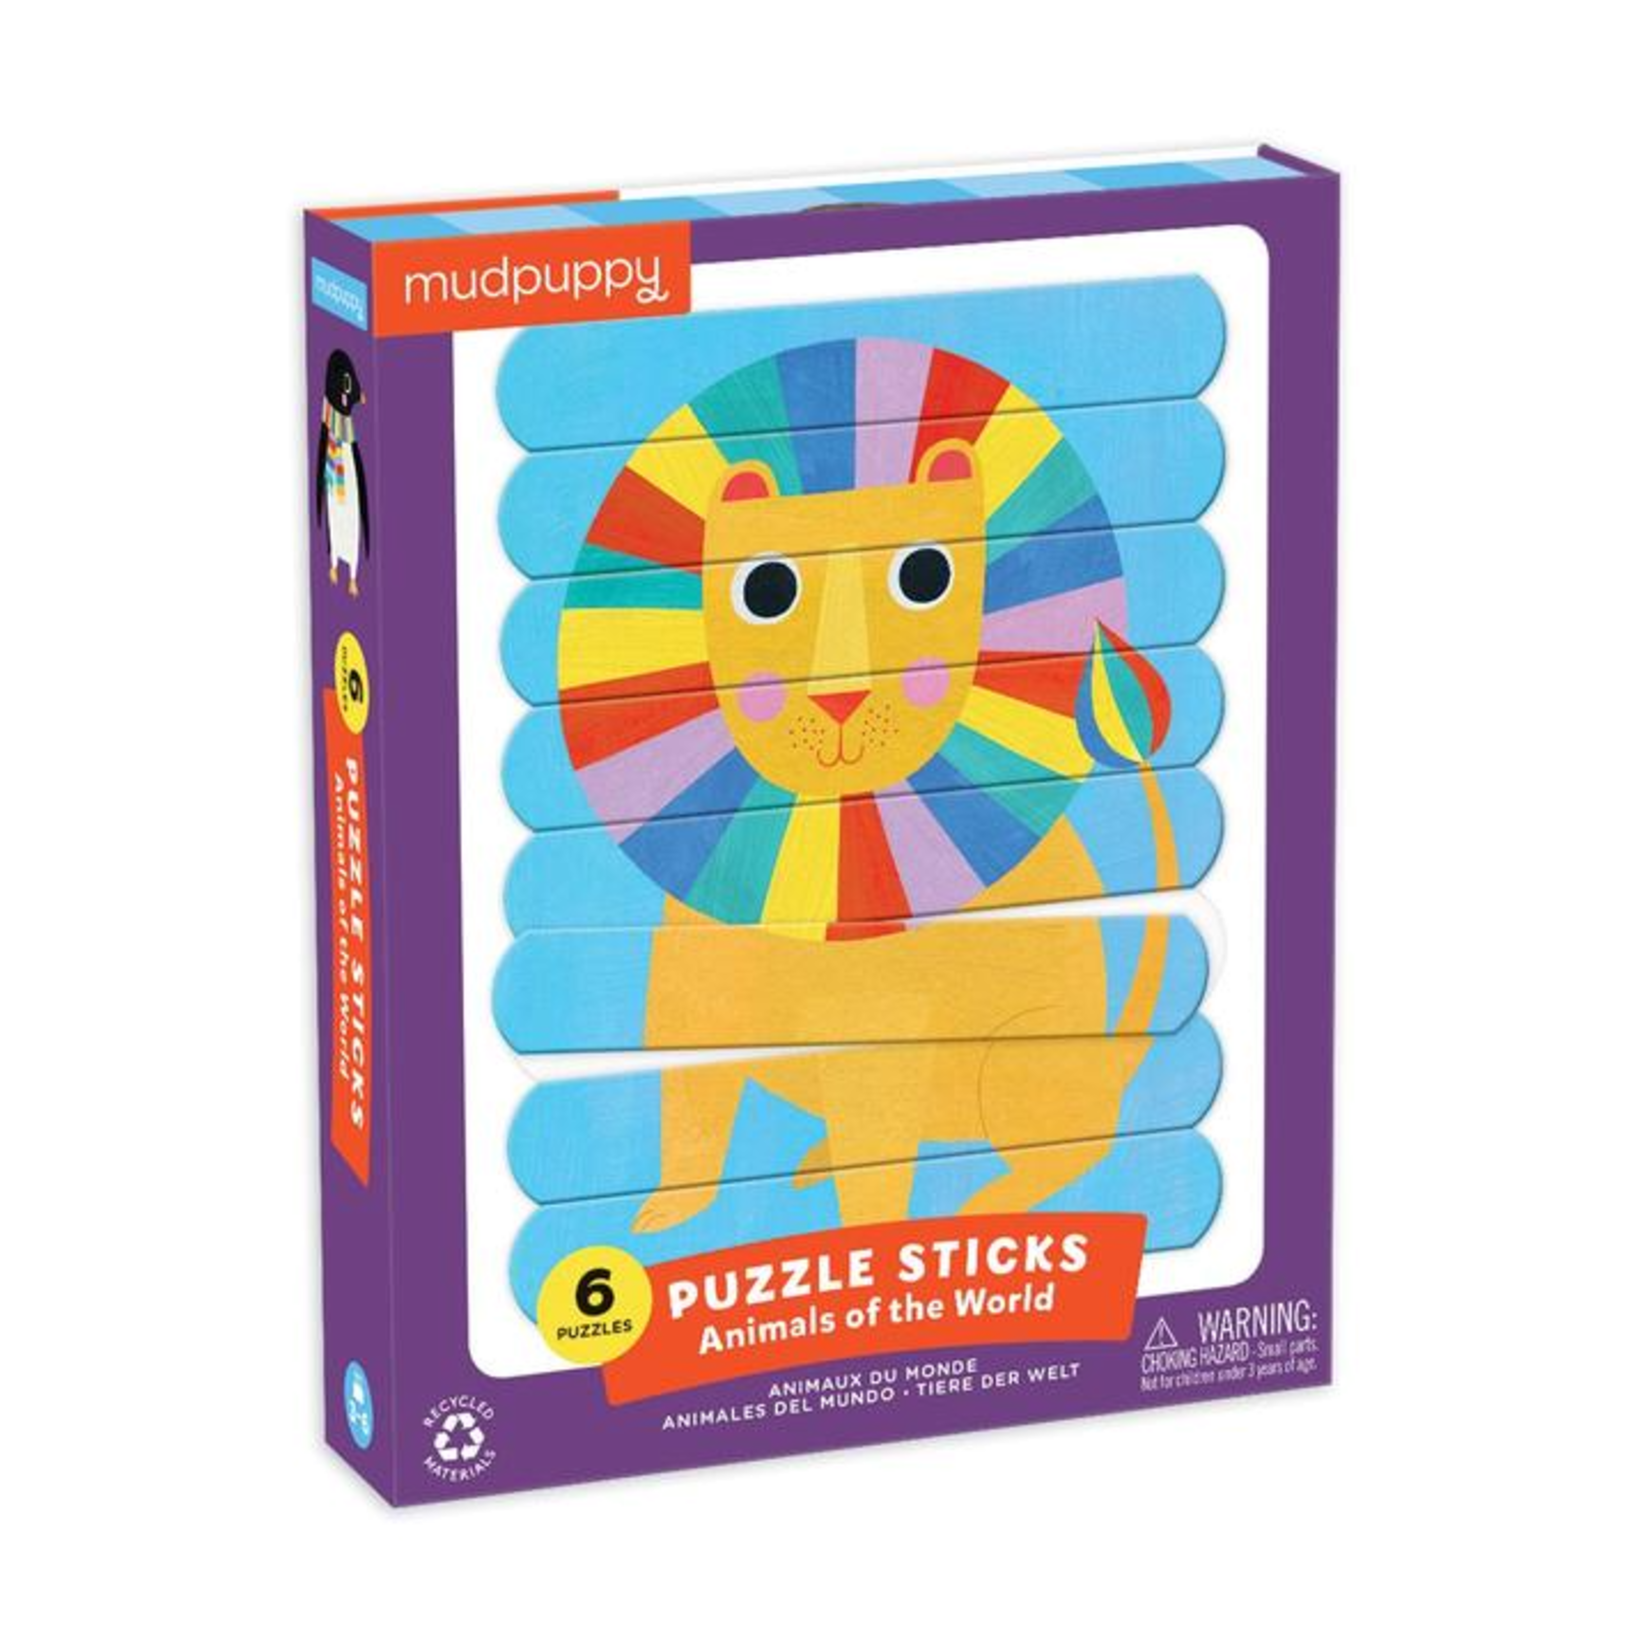 Mudpuppy Animals of the World Puzzle Sticks 6 Pack 8pc